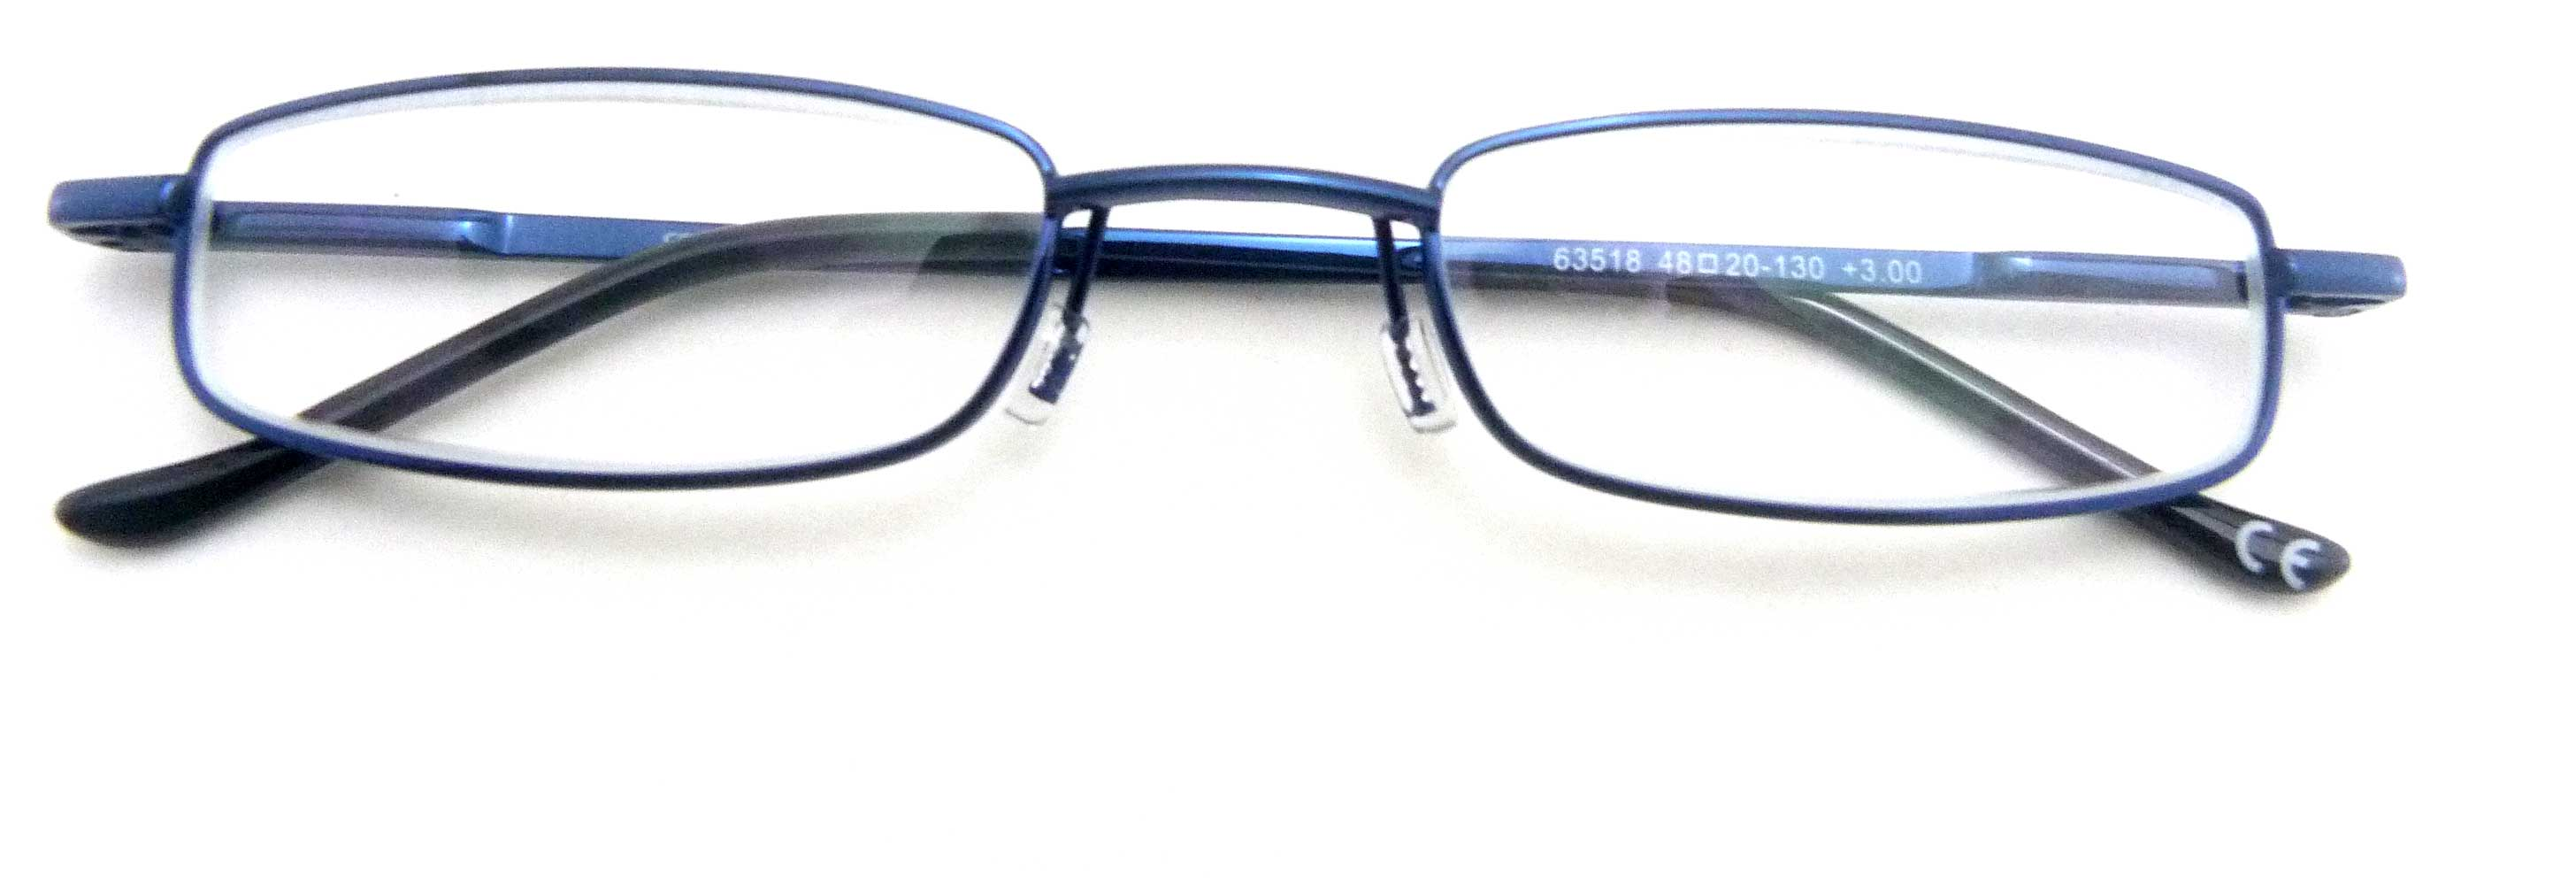 0263512 - Óculos Leitura Flex AT +1,50 Azul Mod 63512 FLAG 9  -Contém 1 Peça